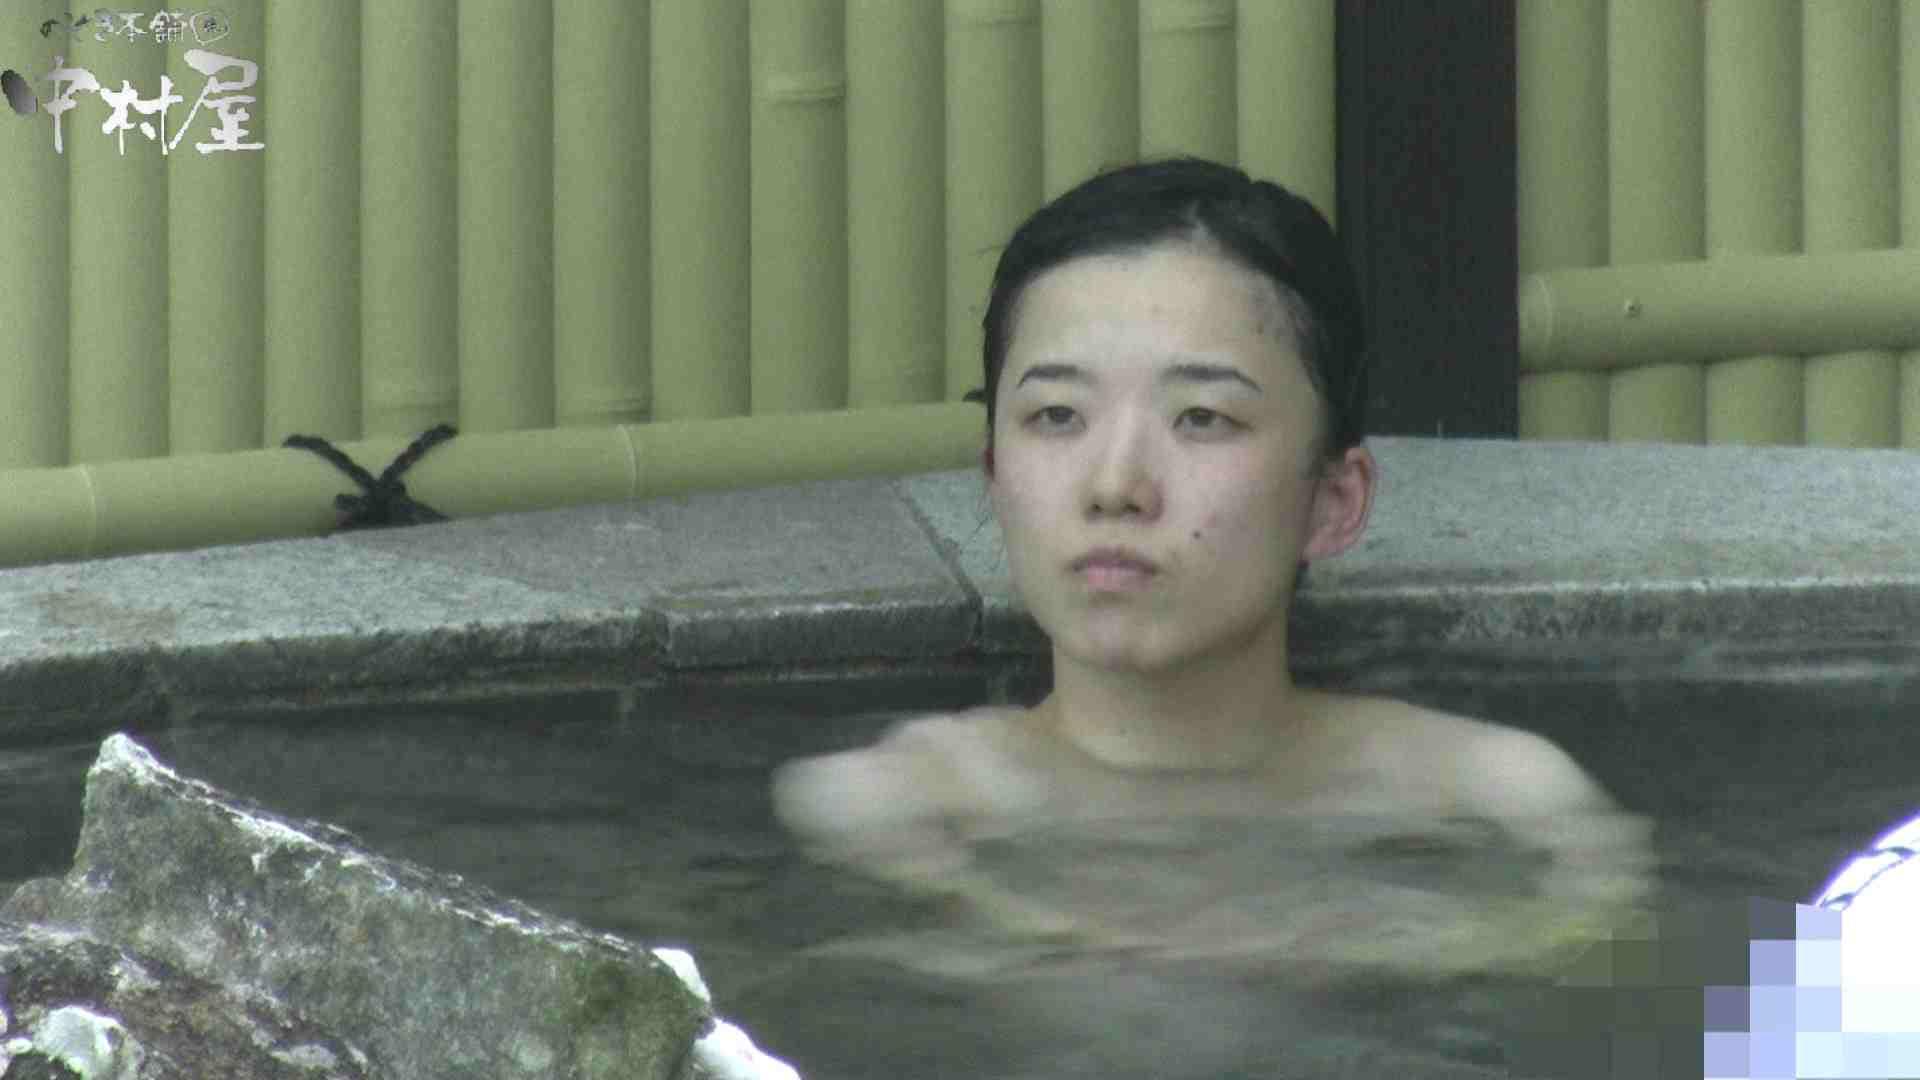 Aquaな露天風呂Vol.908 盗撮  30pic 15